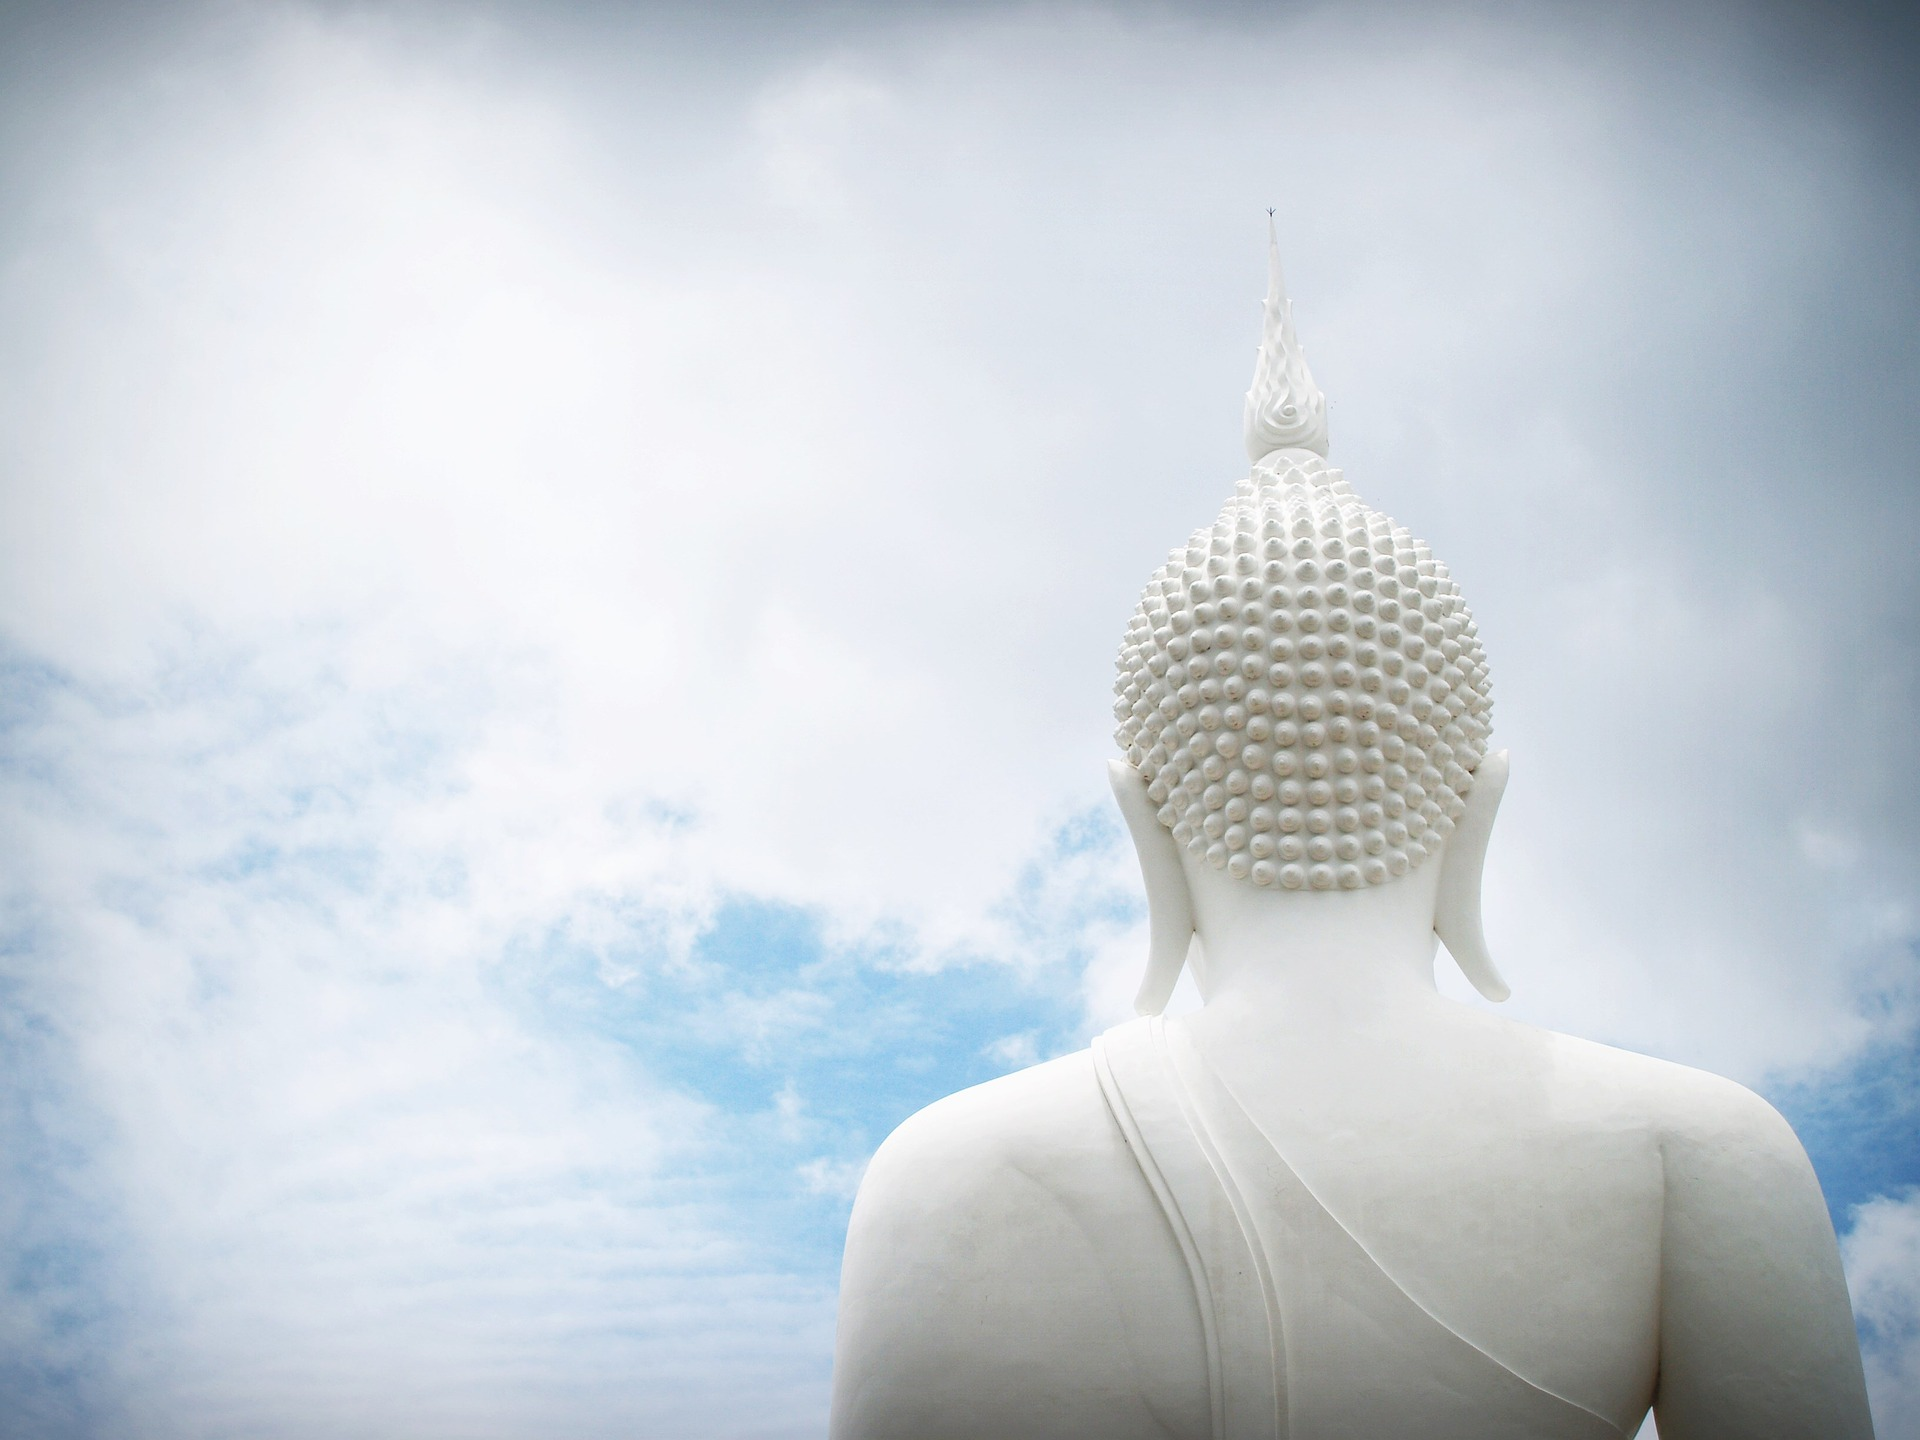 buddha-1550588_1920.jpg